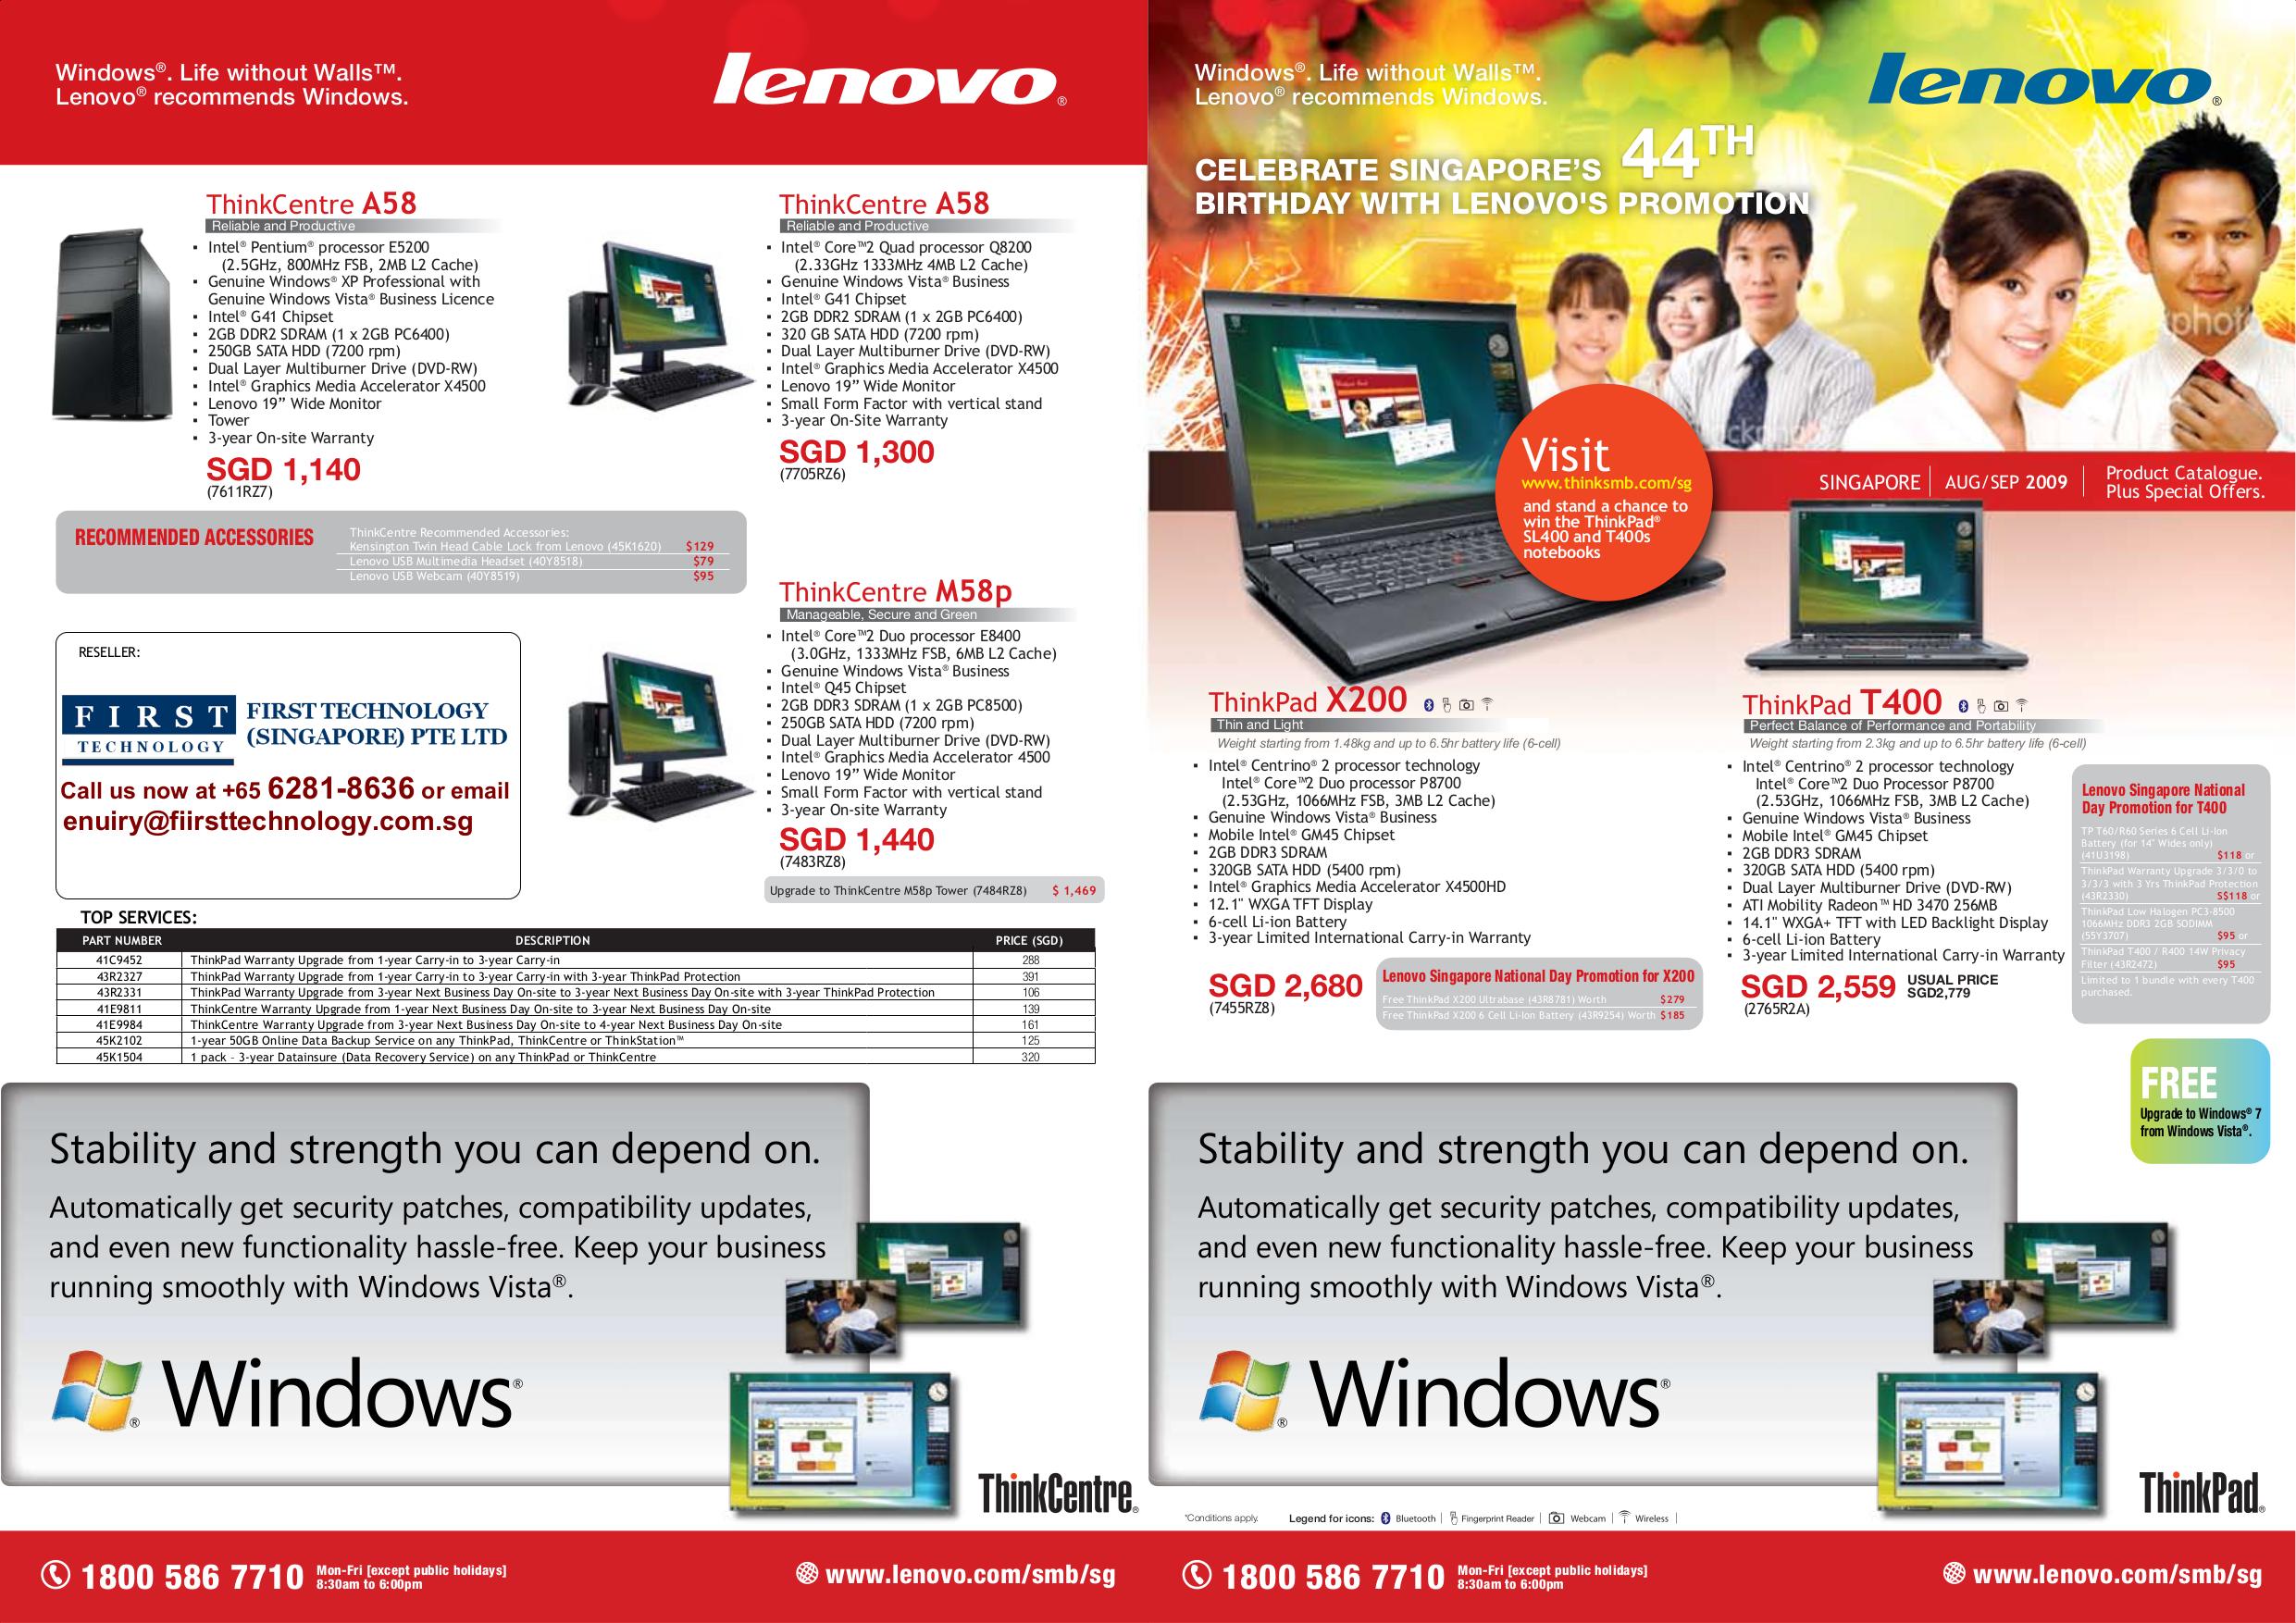 pdf for Lenovo Desktop ThinkCentre A58 7611 manual